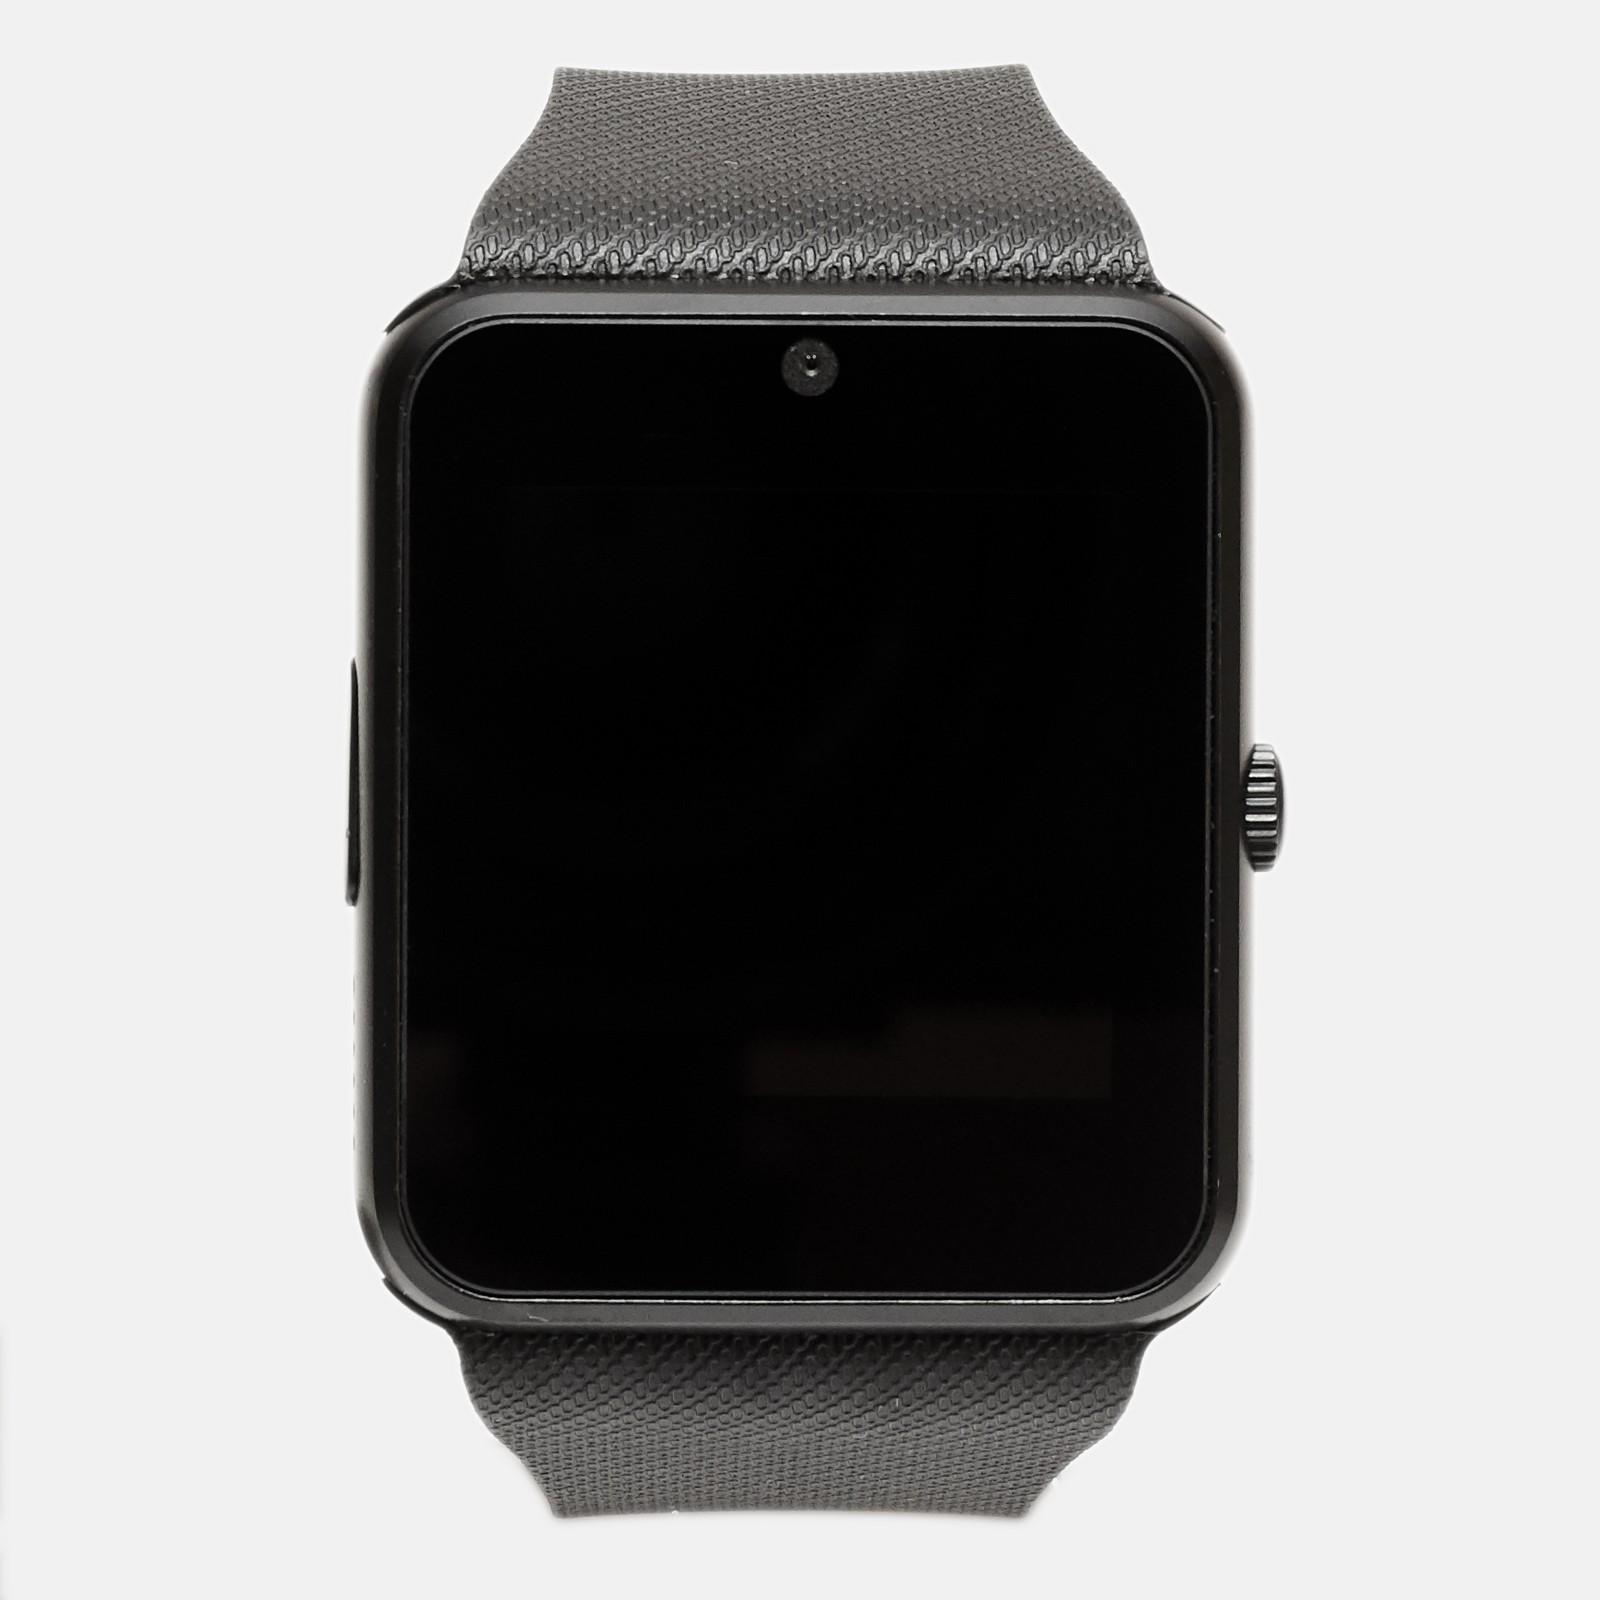 Умные часы Uwatch GT08 Black